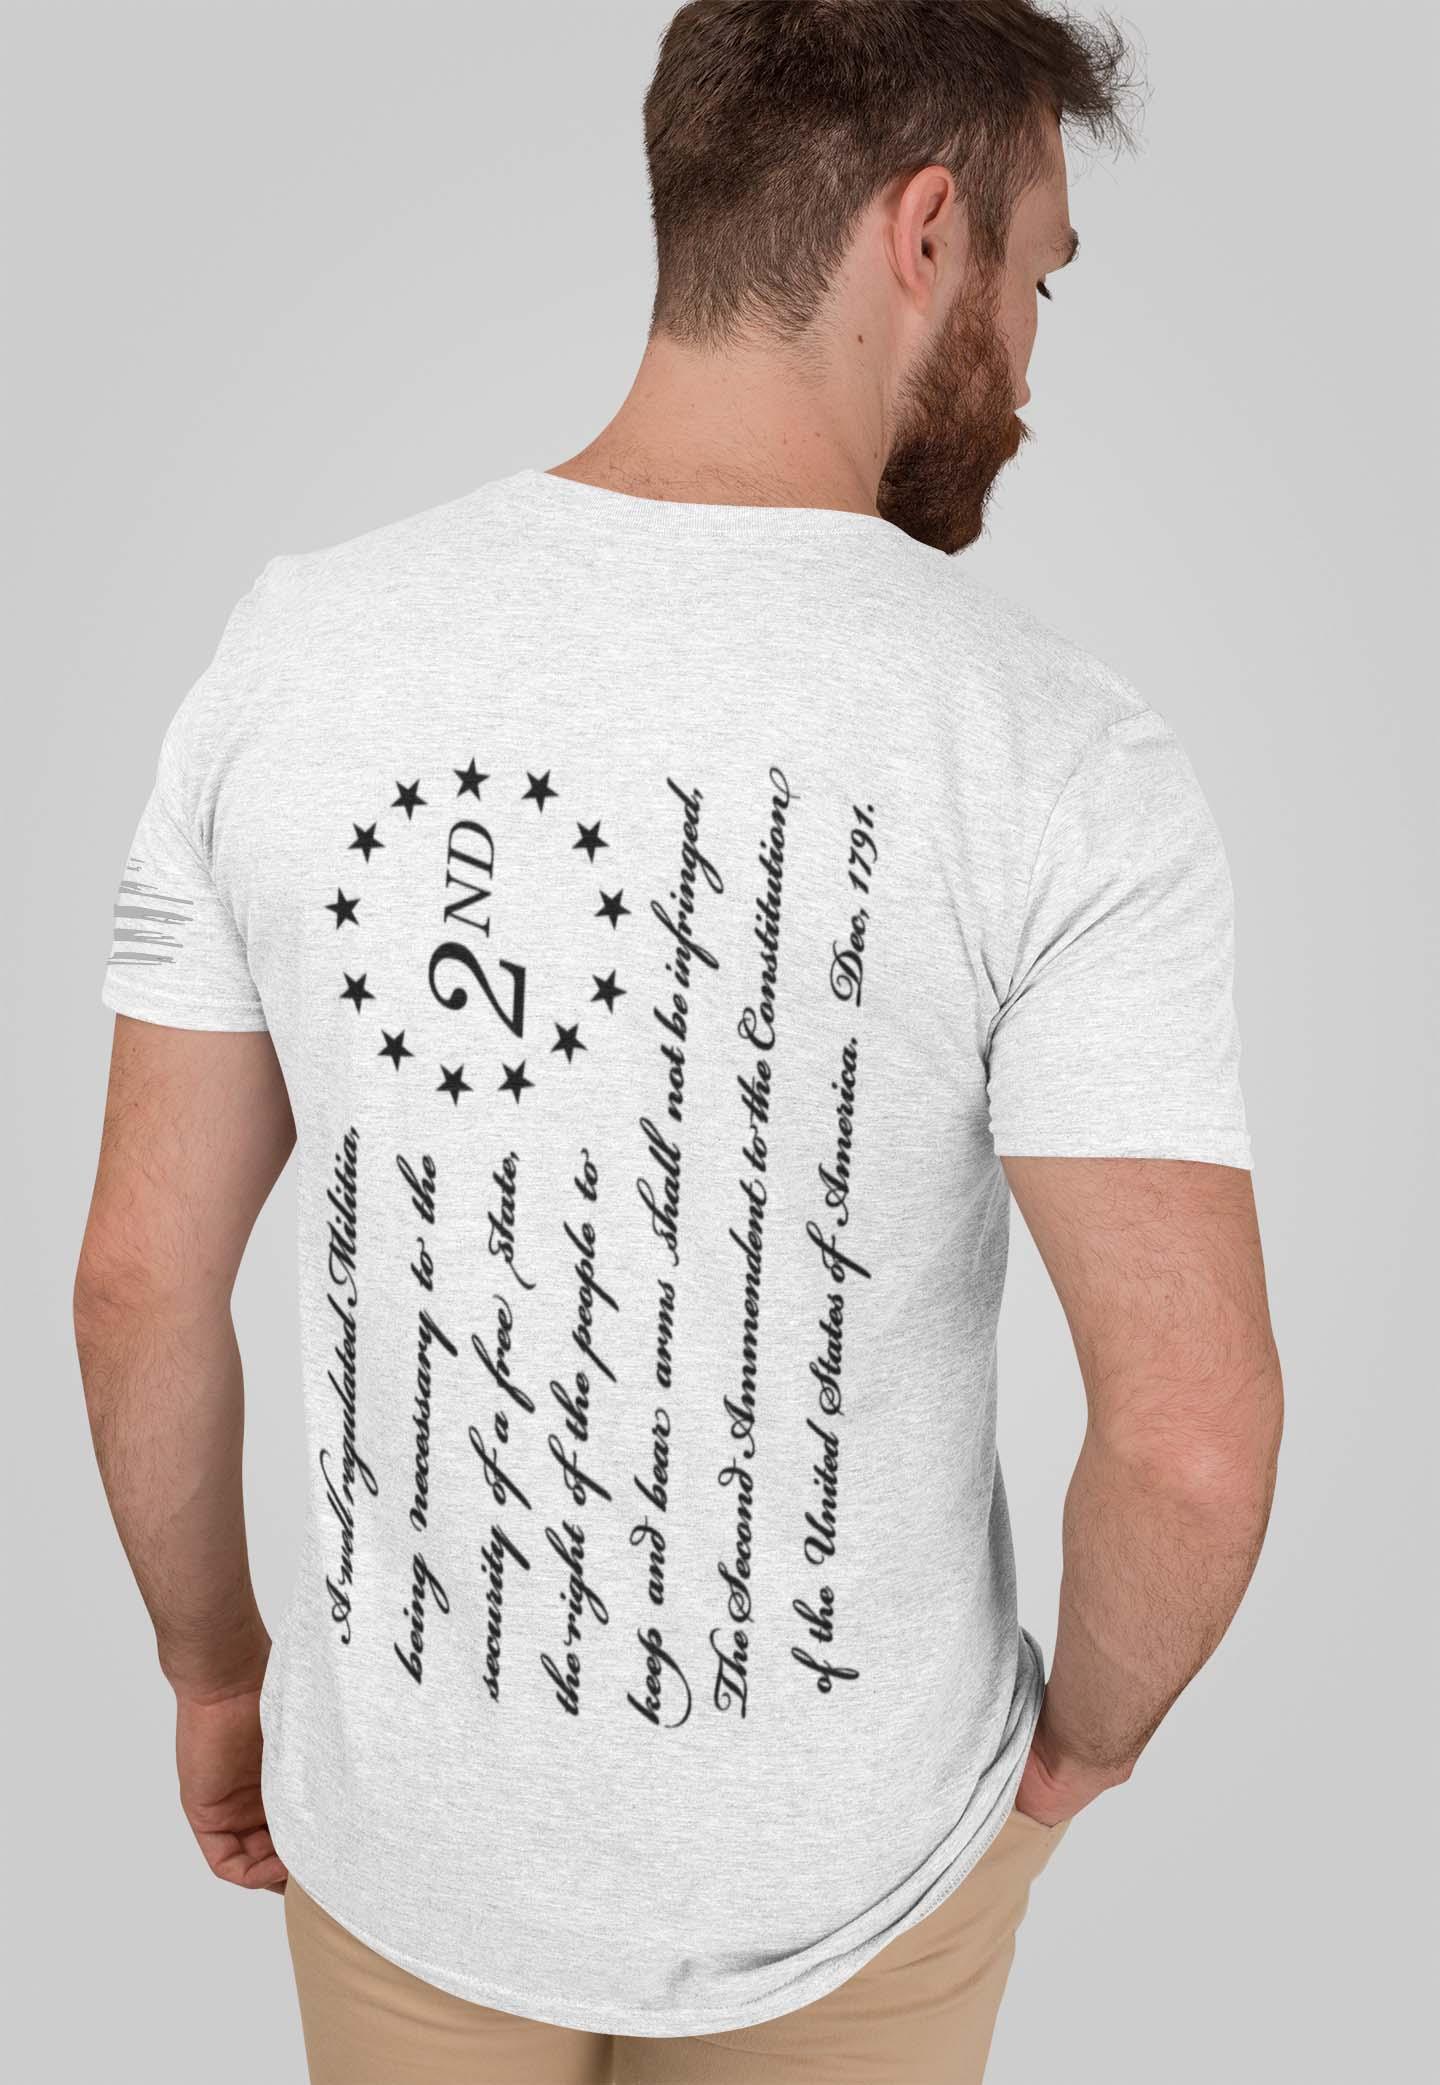 2nd Amendment on a mens light heather gray tshirt